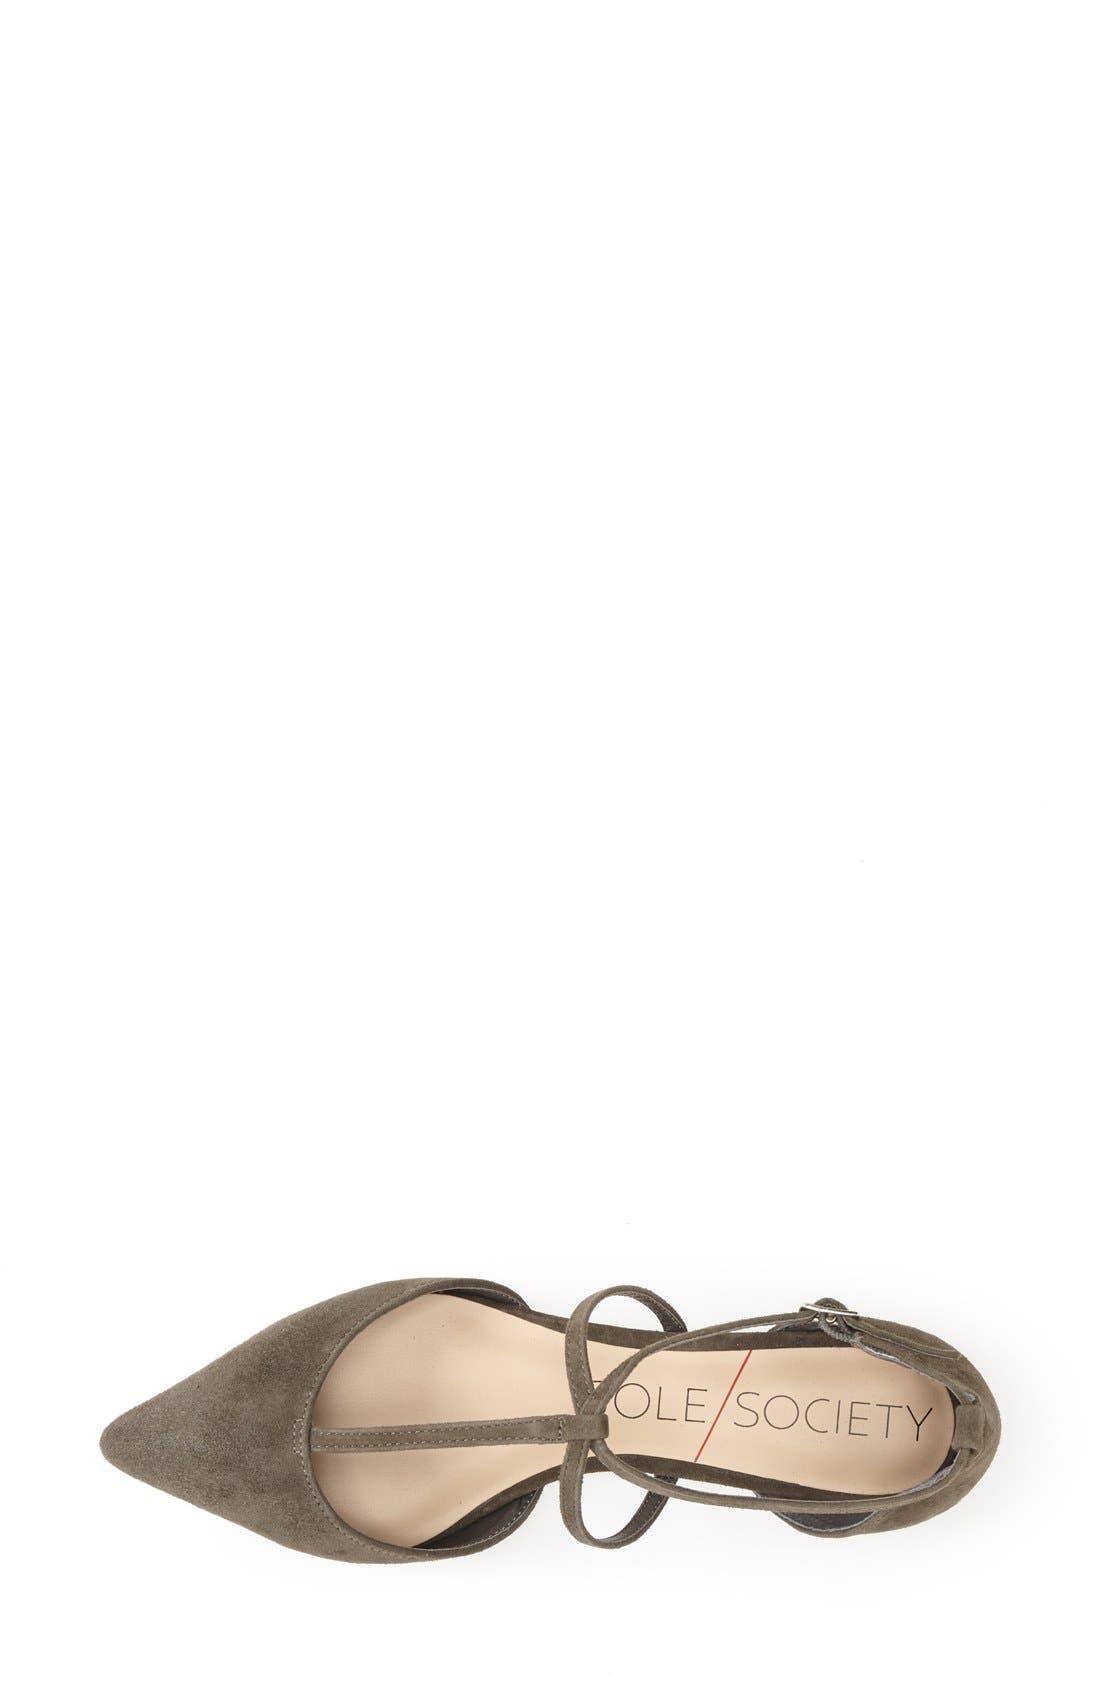 Alternate Image 3  - Sole Society 'Chandler' Pointy Toe Flat (Women)